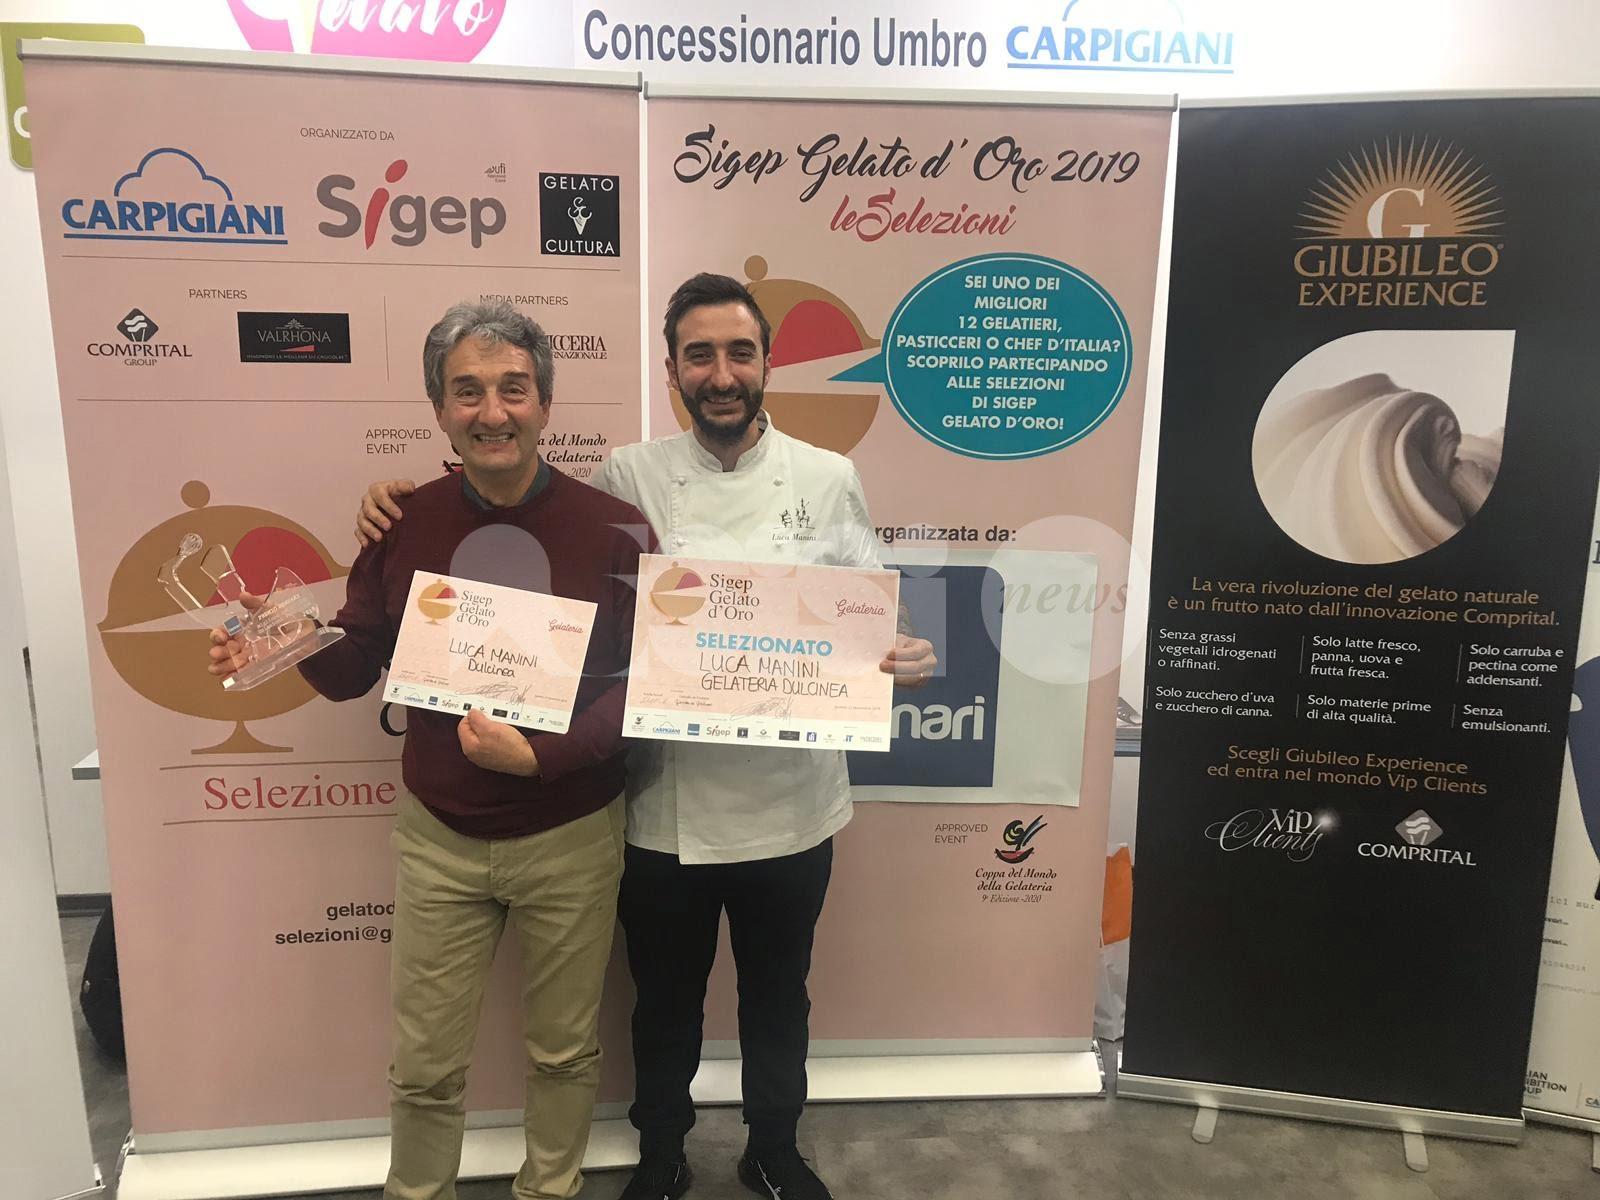 Sigep Gelato d'Oro 2019, Dulcinea Gelateria vince la tappa umbra